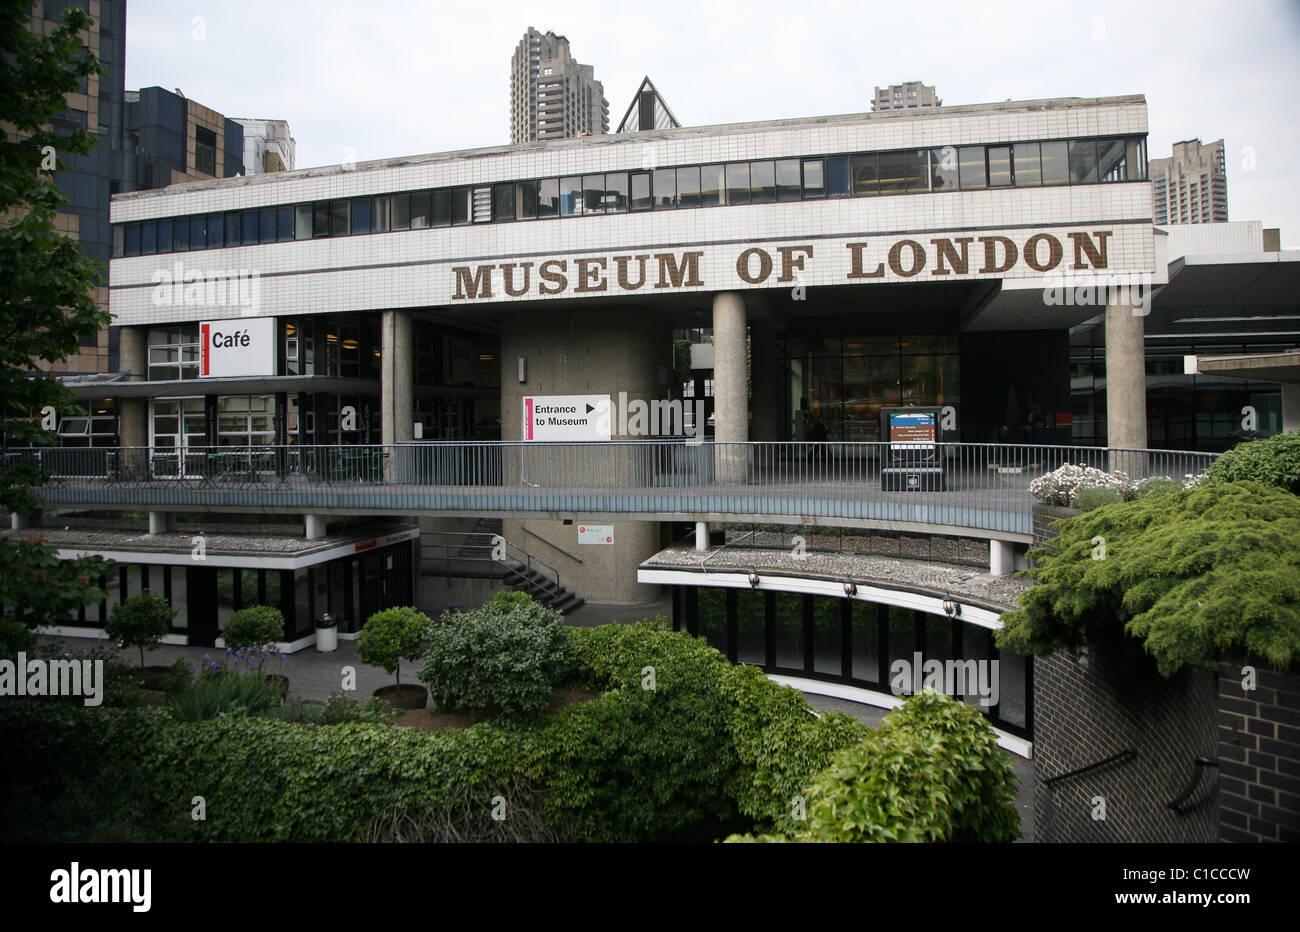 Vista generale gv del Museo di Londra a Londra, Inghilterra. Immagini Stock